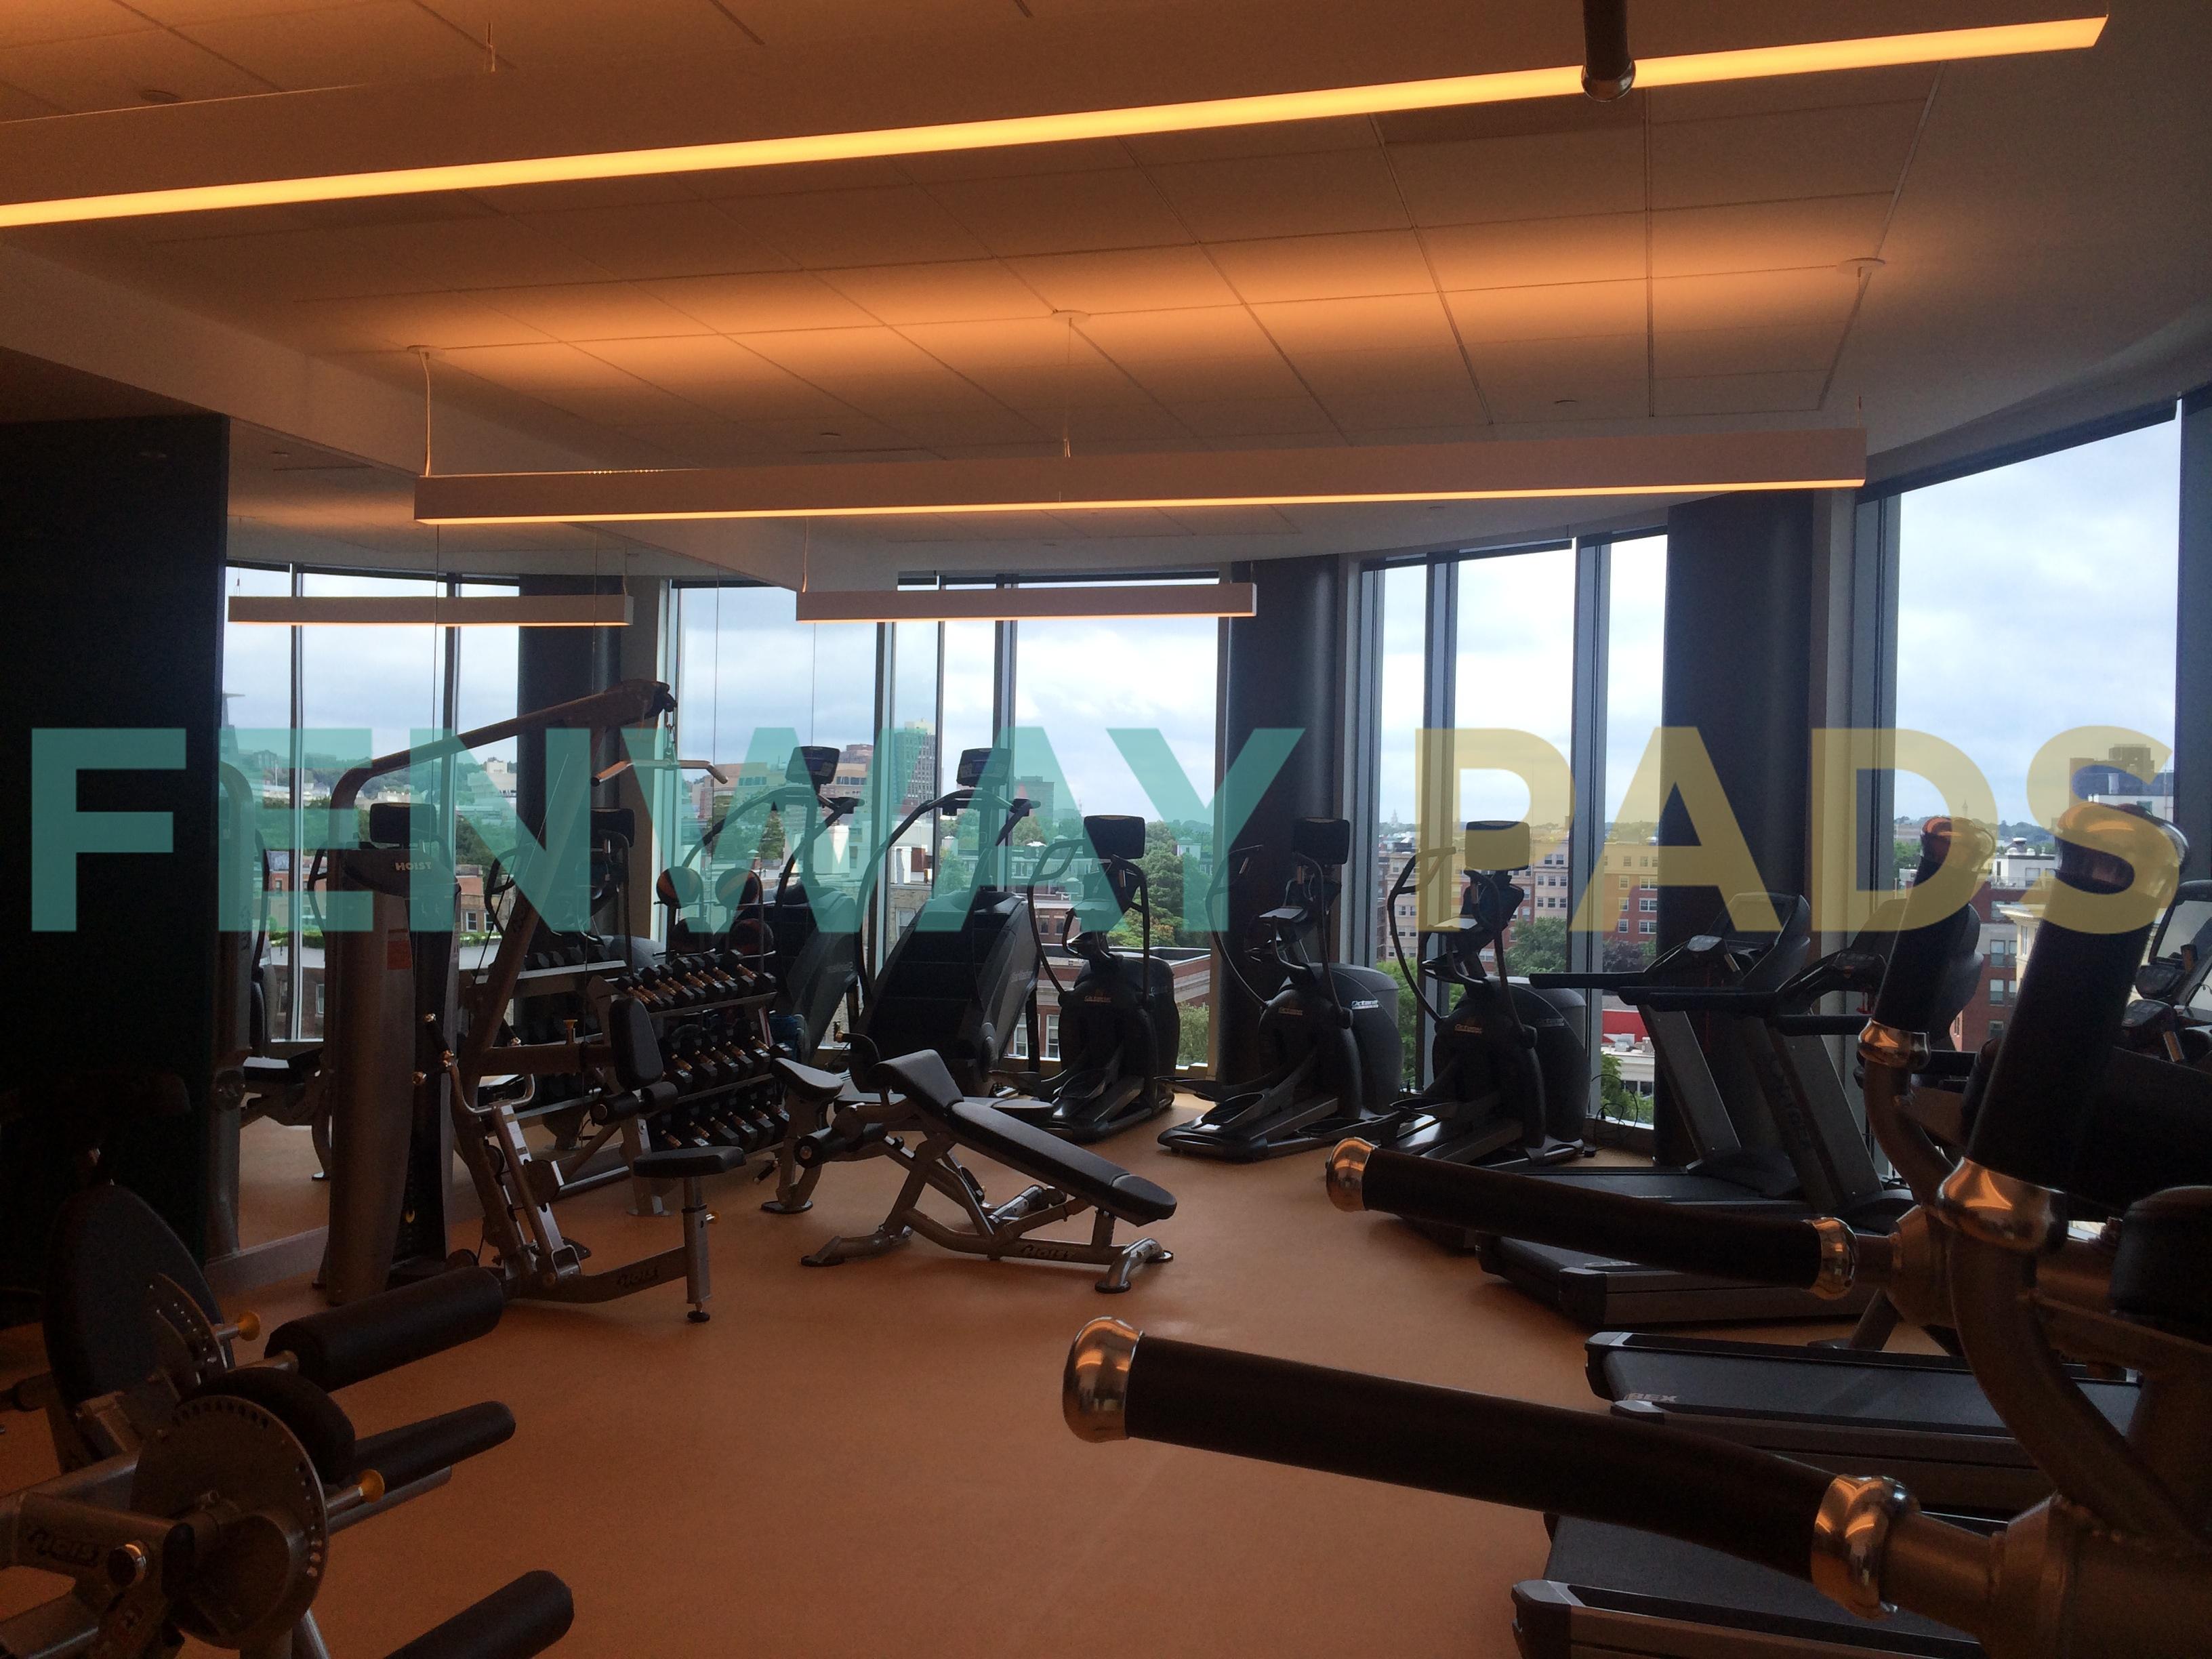 Van Ness fitness center